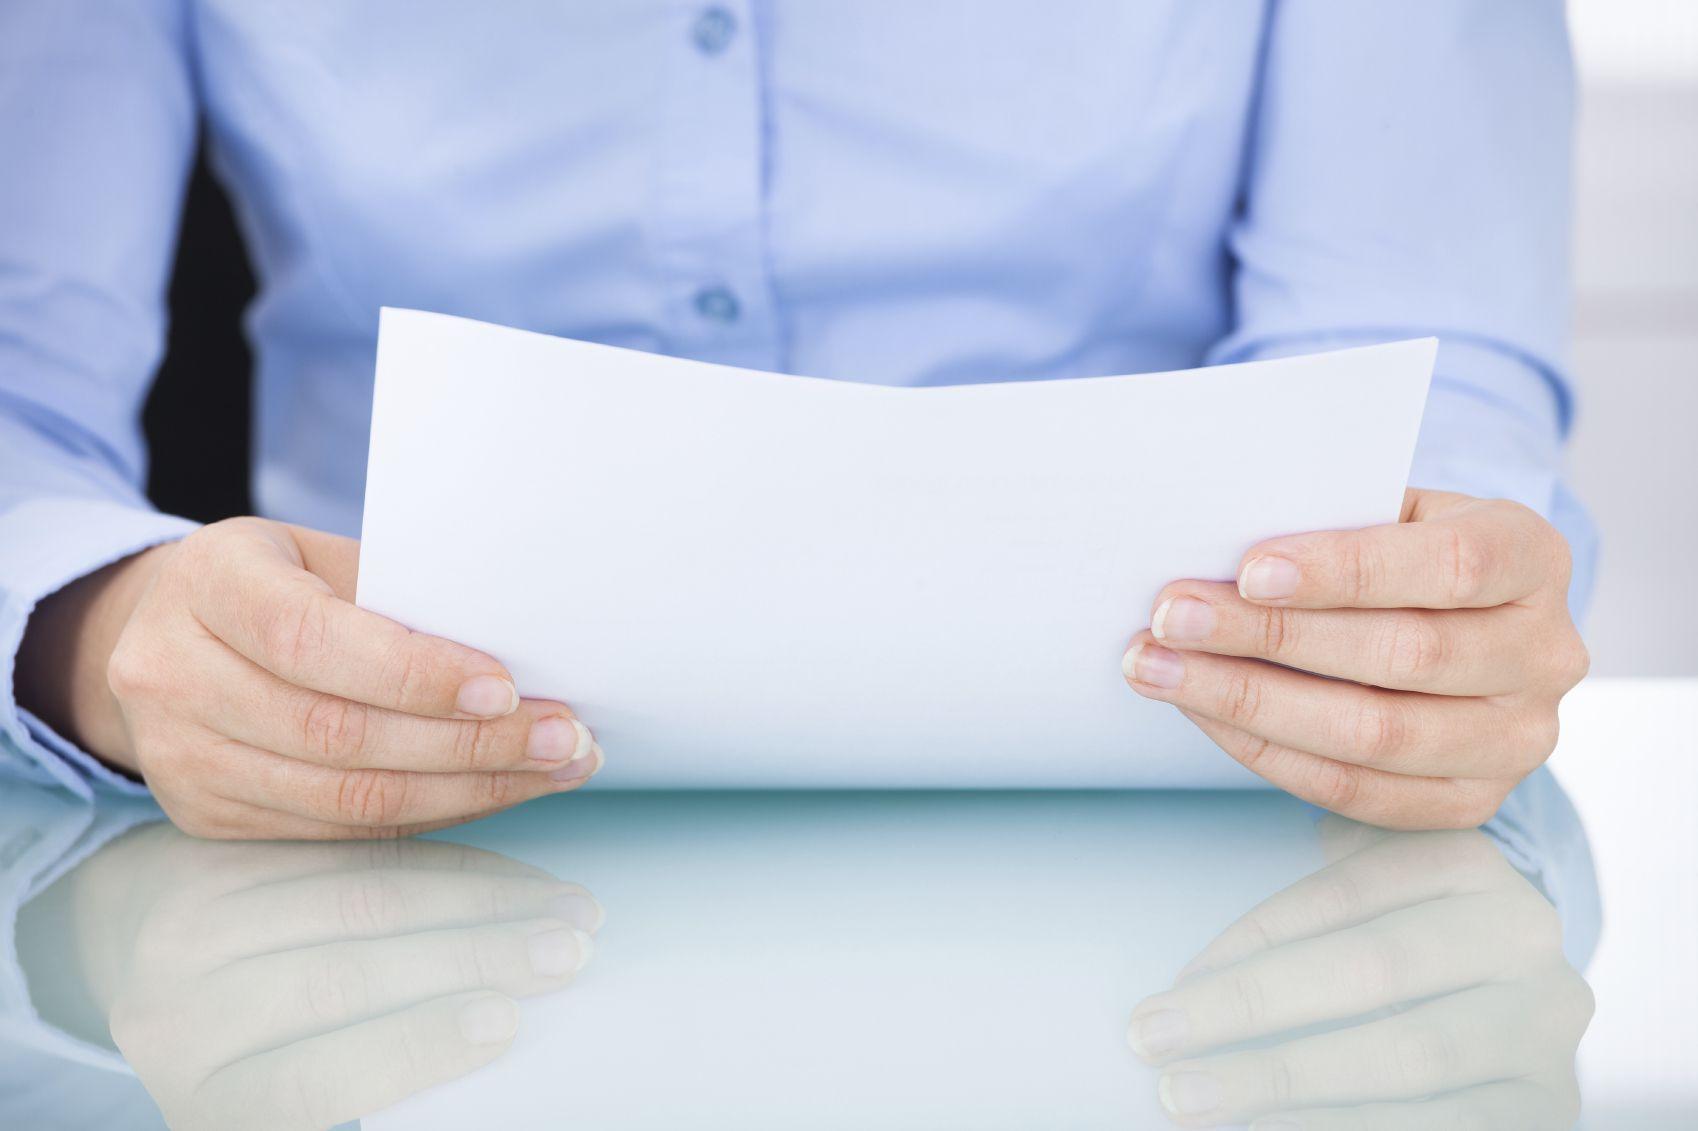 Resignation Letter Email Or Hard Copy     Resignation     SlidePlayer